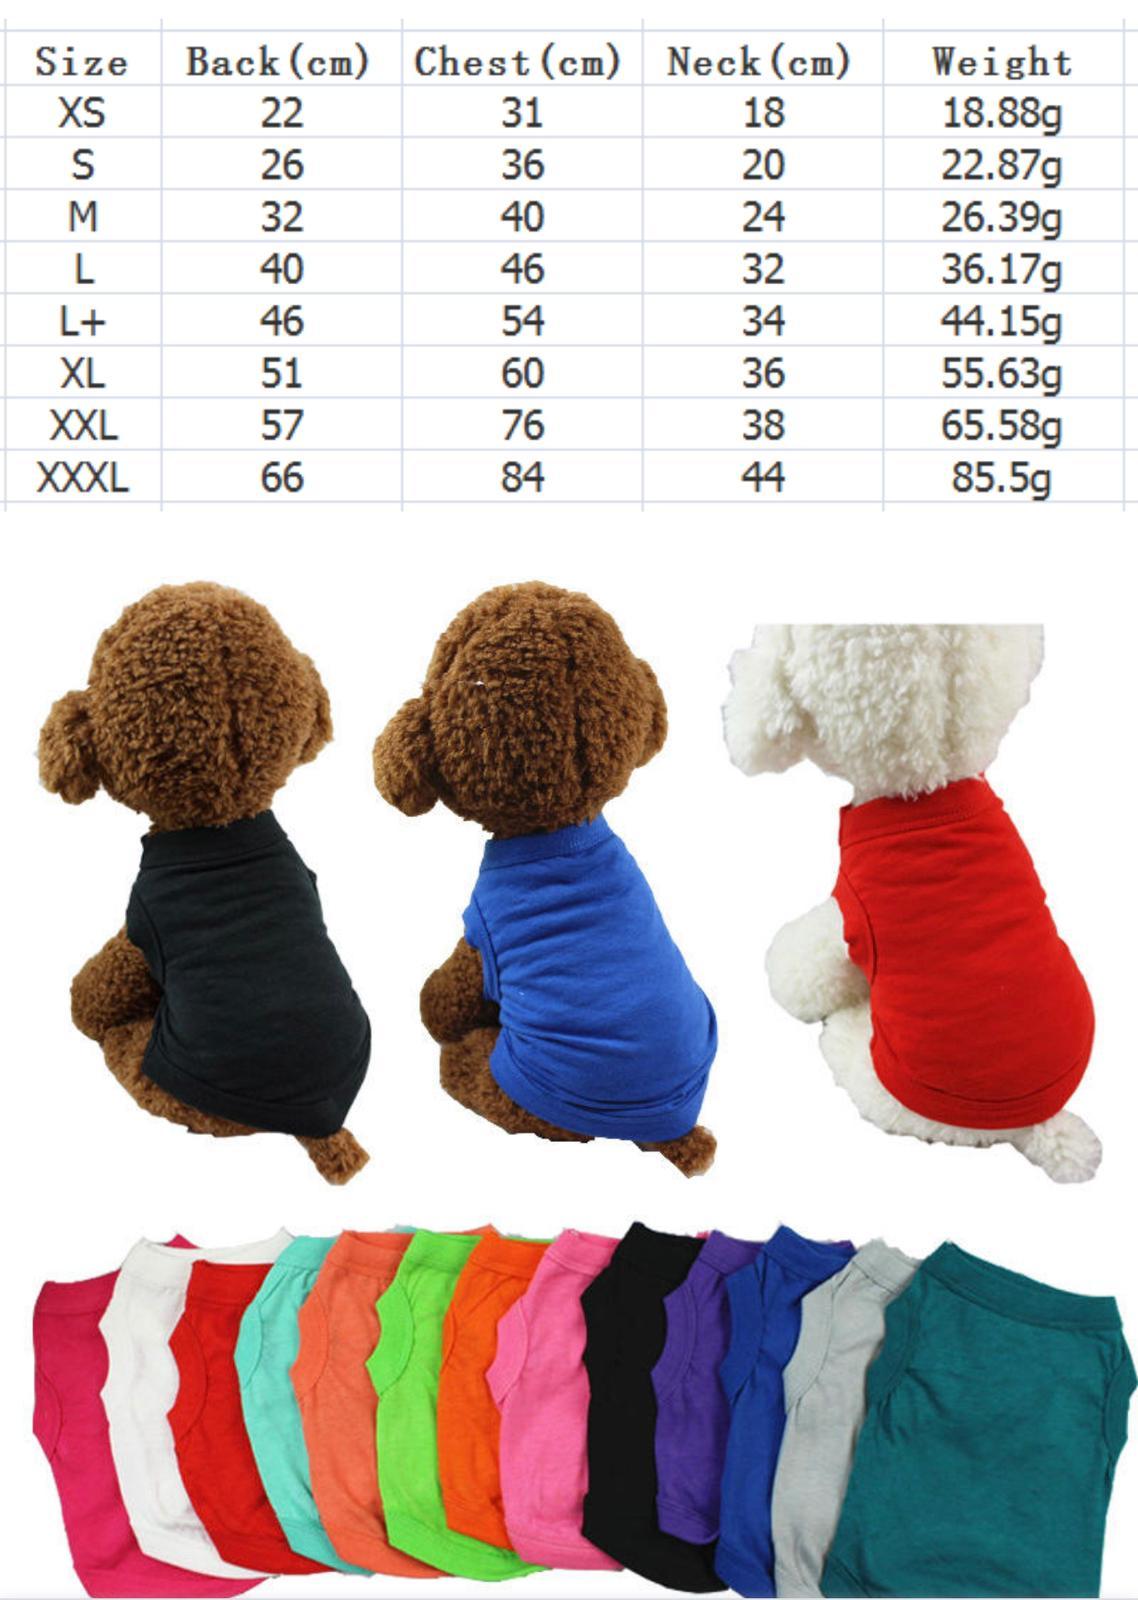 Plain Green T- Shirt Medium - Dogs Apparel & Accessories product